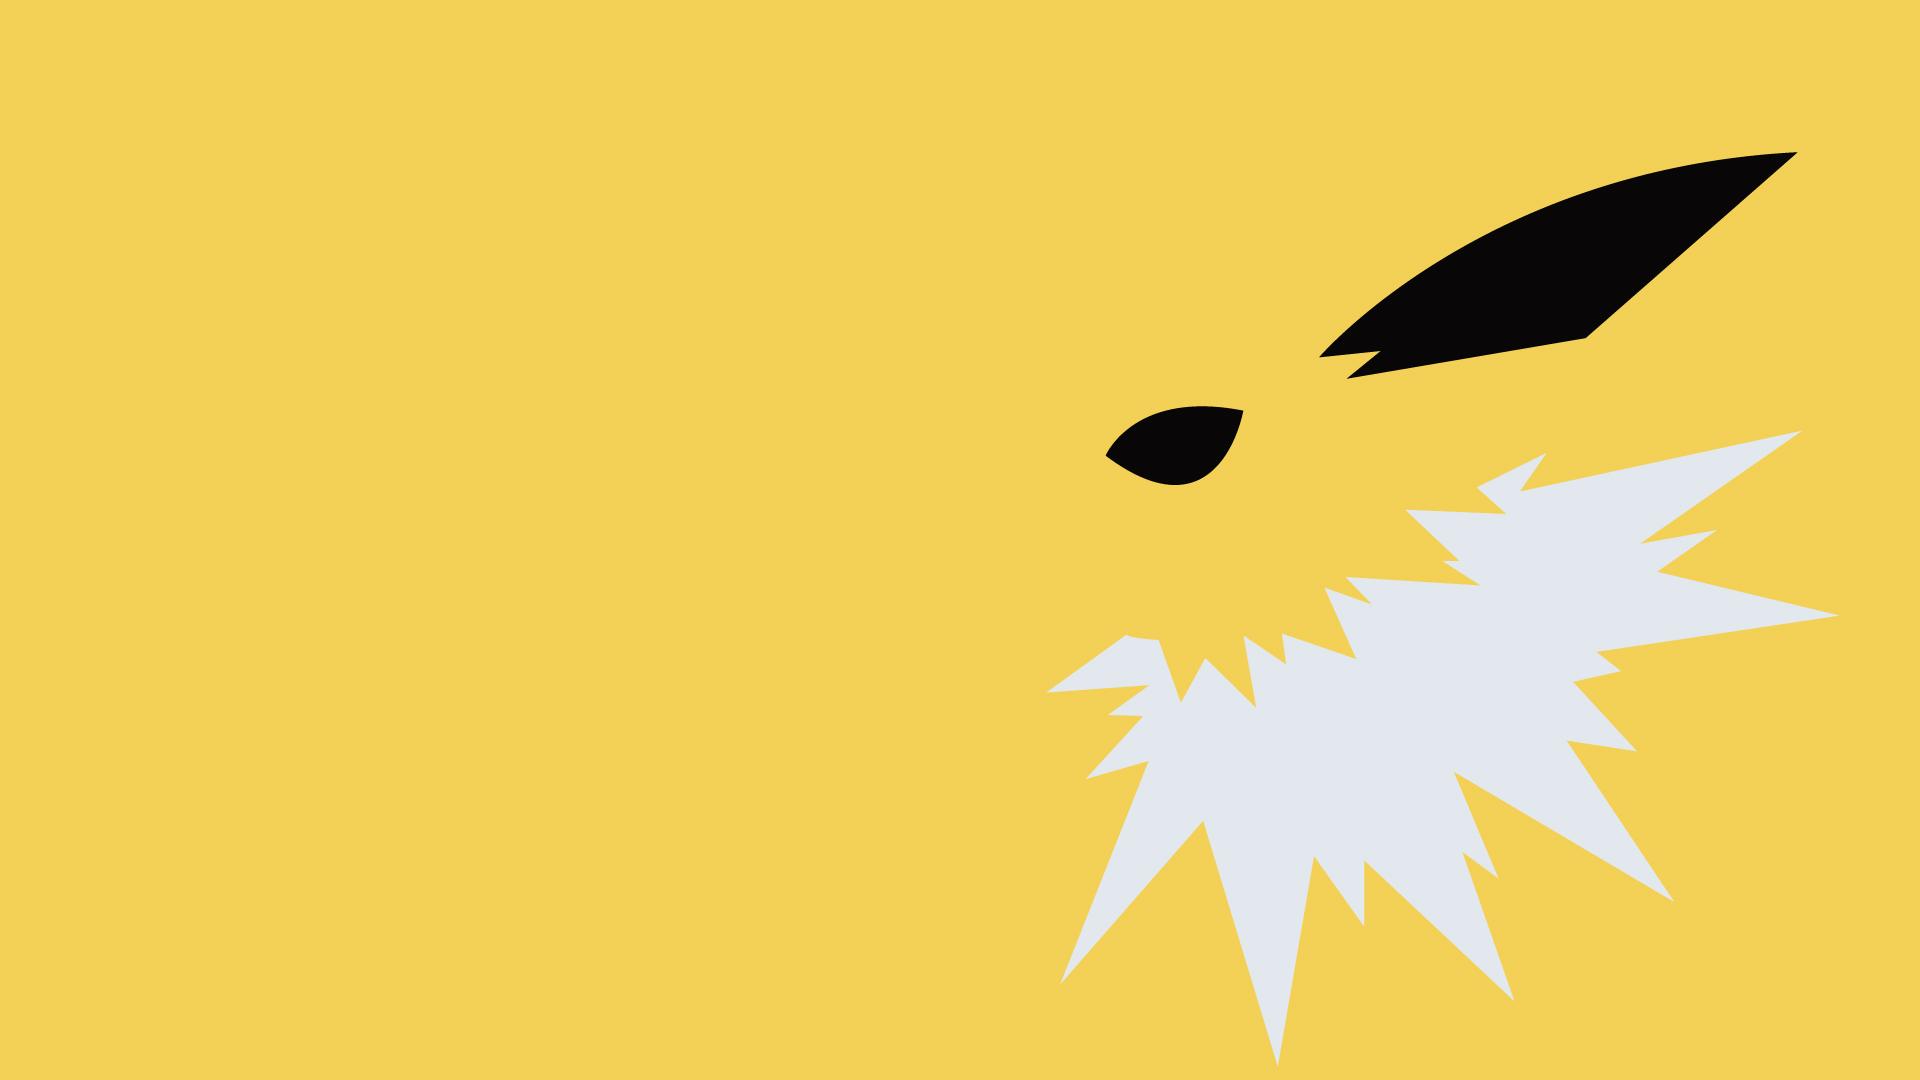 Jolteon Iphone Wallpaper Anime - Pokemon Wallpaper